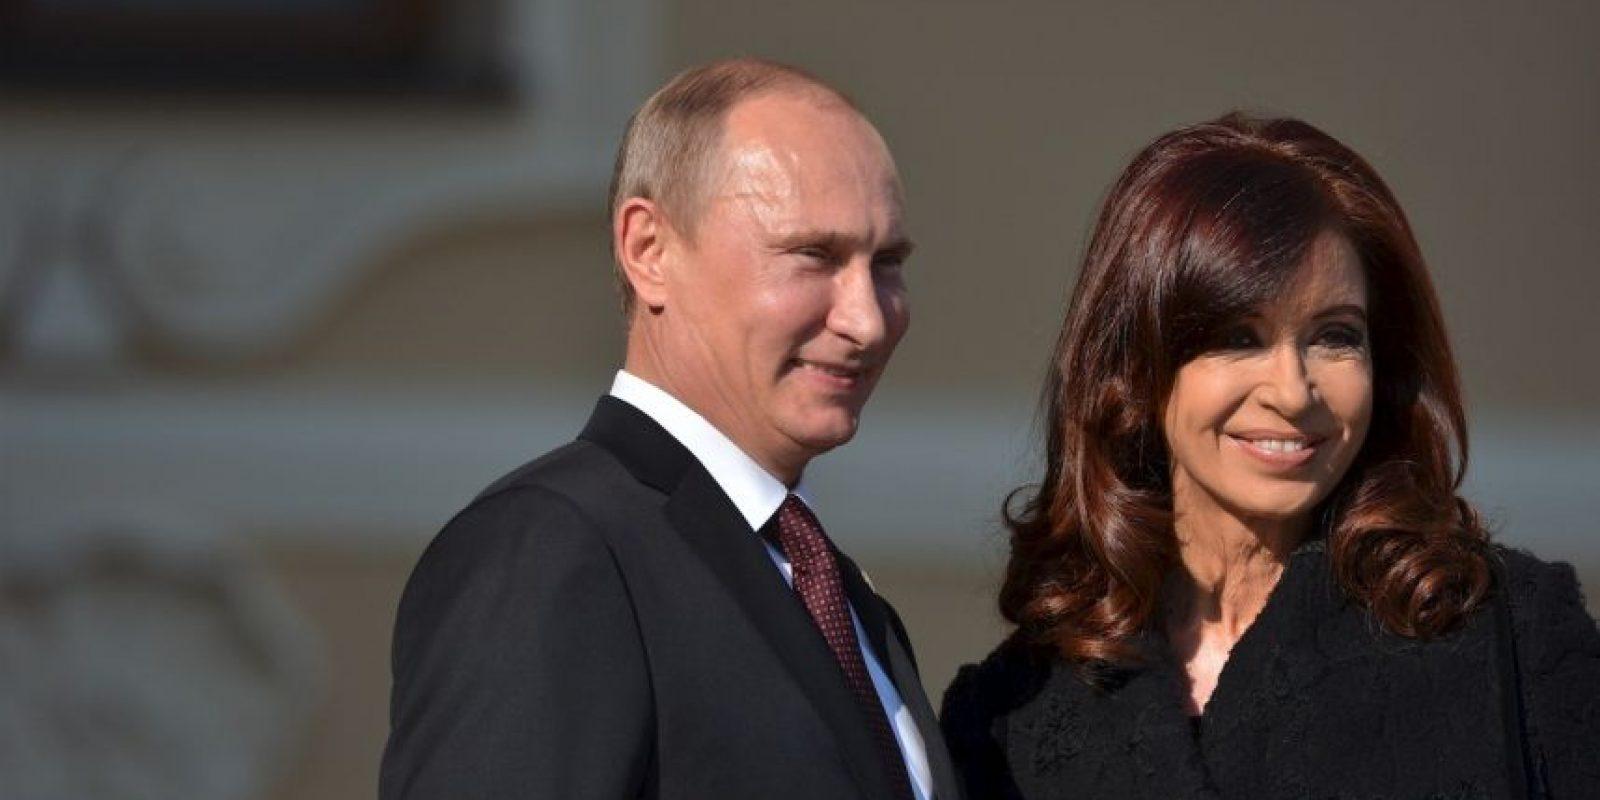 2013, con Vladimir Putin, presidente de Rusia Foto:Getty Images